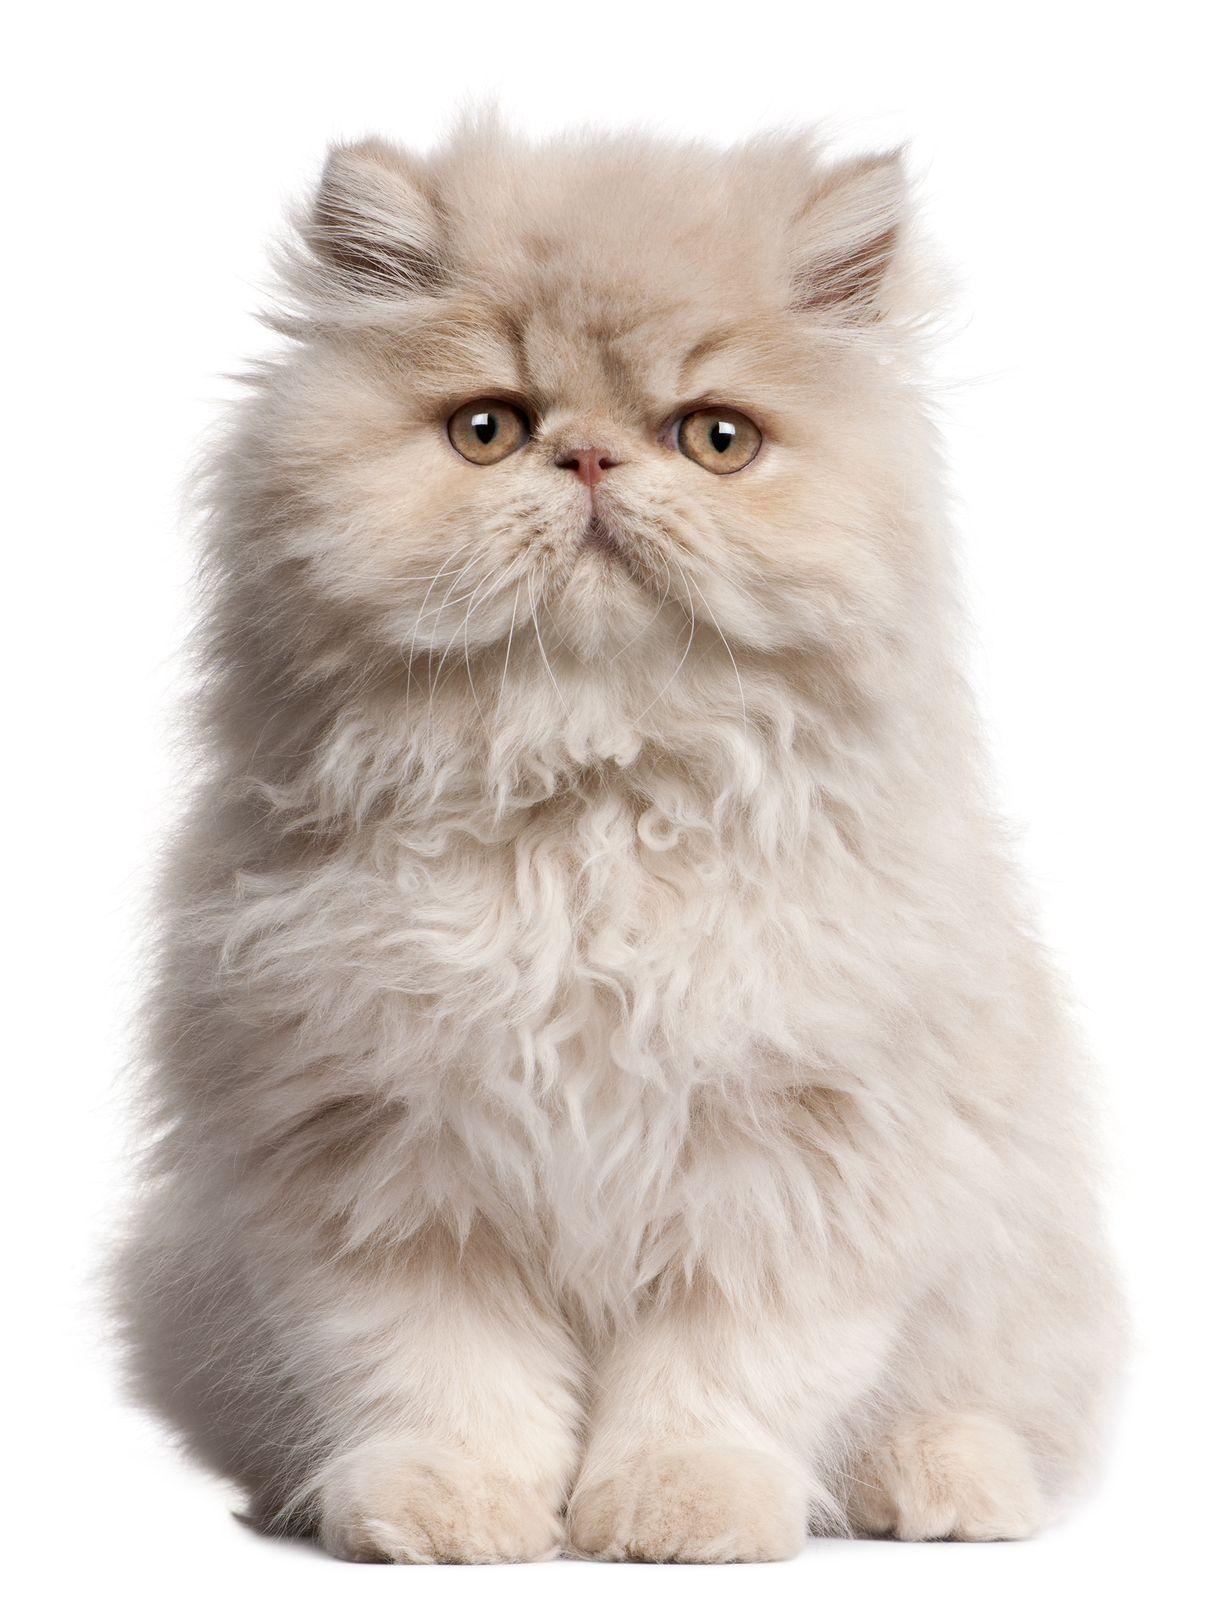 Fluffy Cat Flat Face Wallpaper Hd Persian Kittens Cute Cats